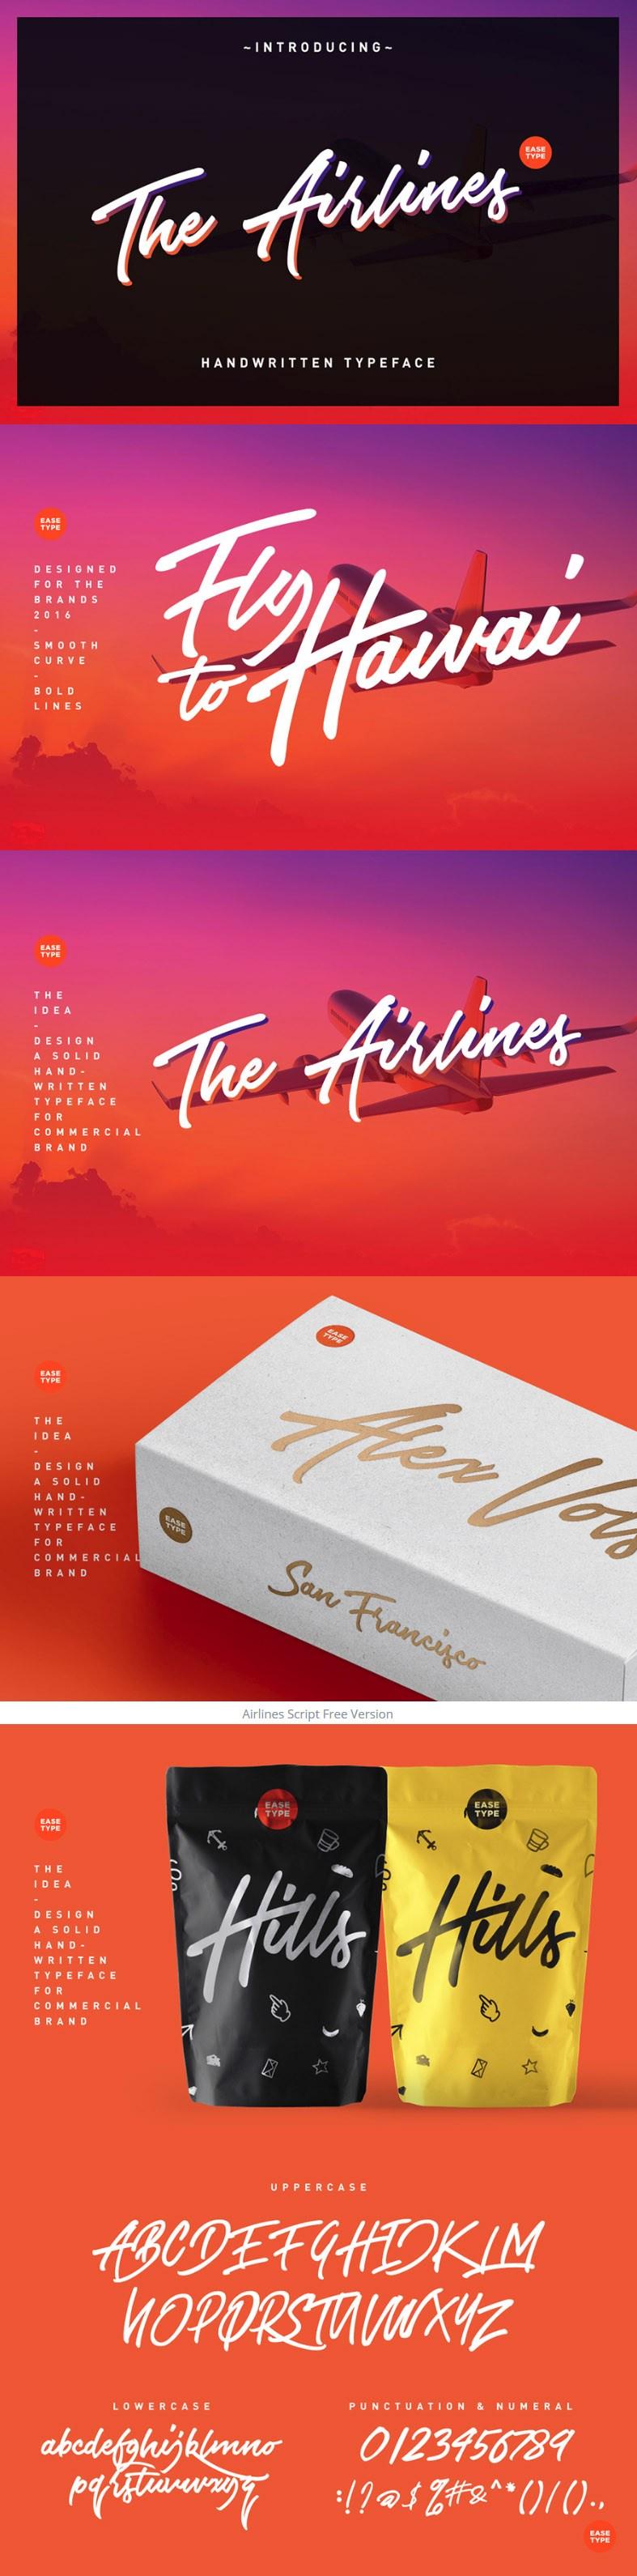 https://fontclarity.com/wp-content/uploads/2019/09/airlines-download-0.jpg Free Download